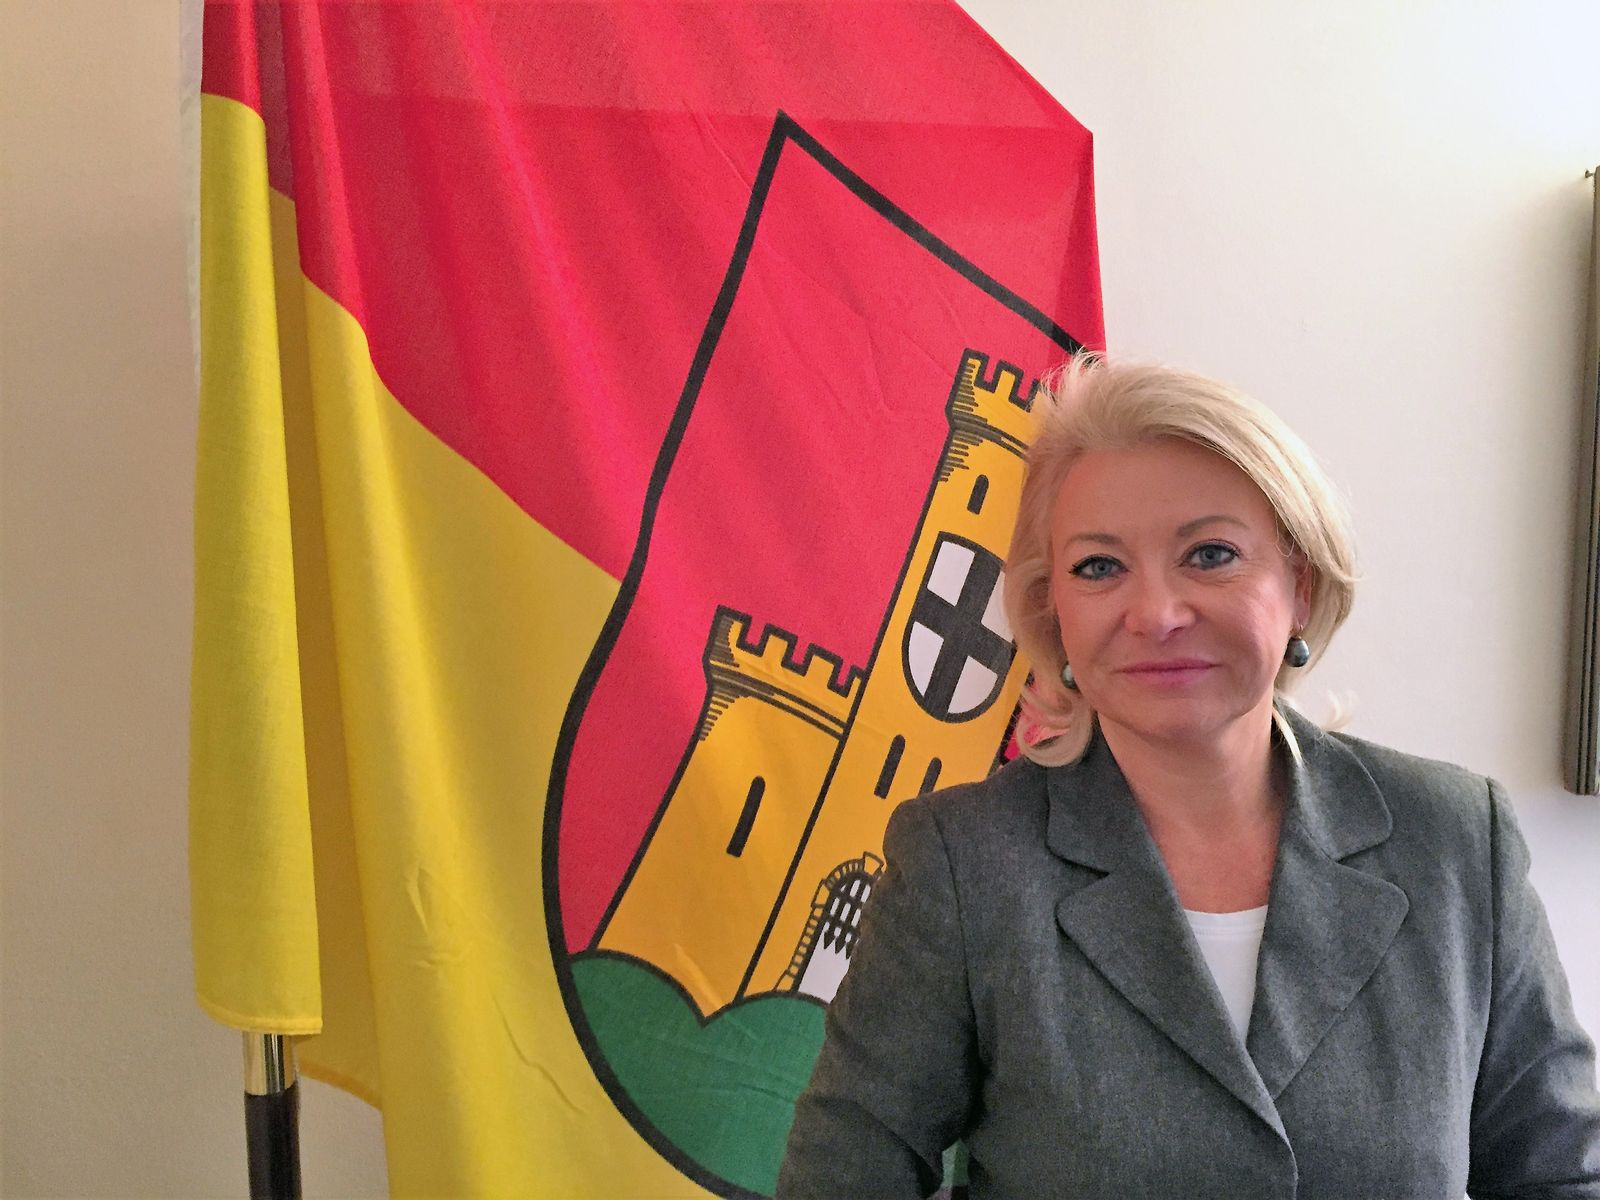 Simone Stein-Lücke